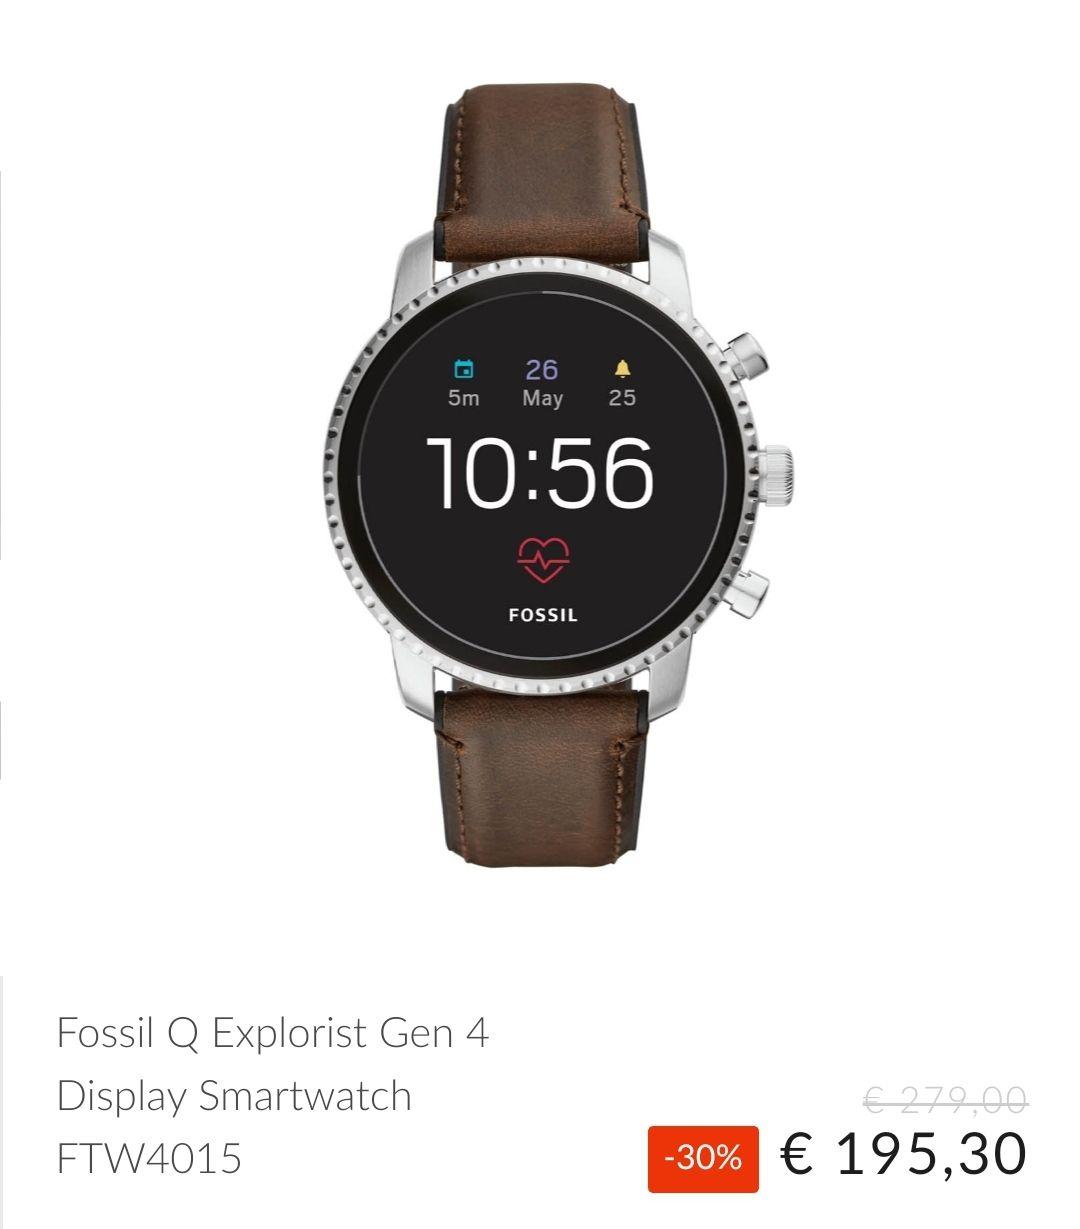 Fossil Q Explorist ftw4015 (gen 4) Smartwatch